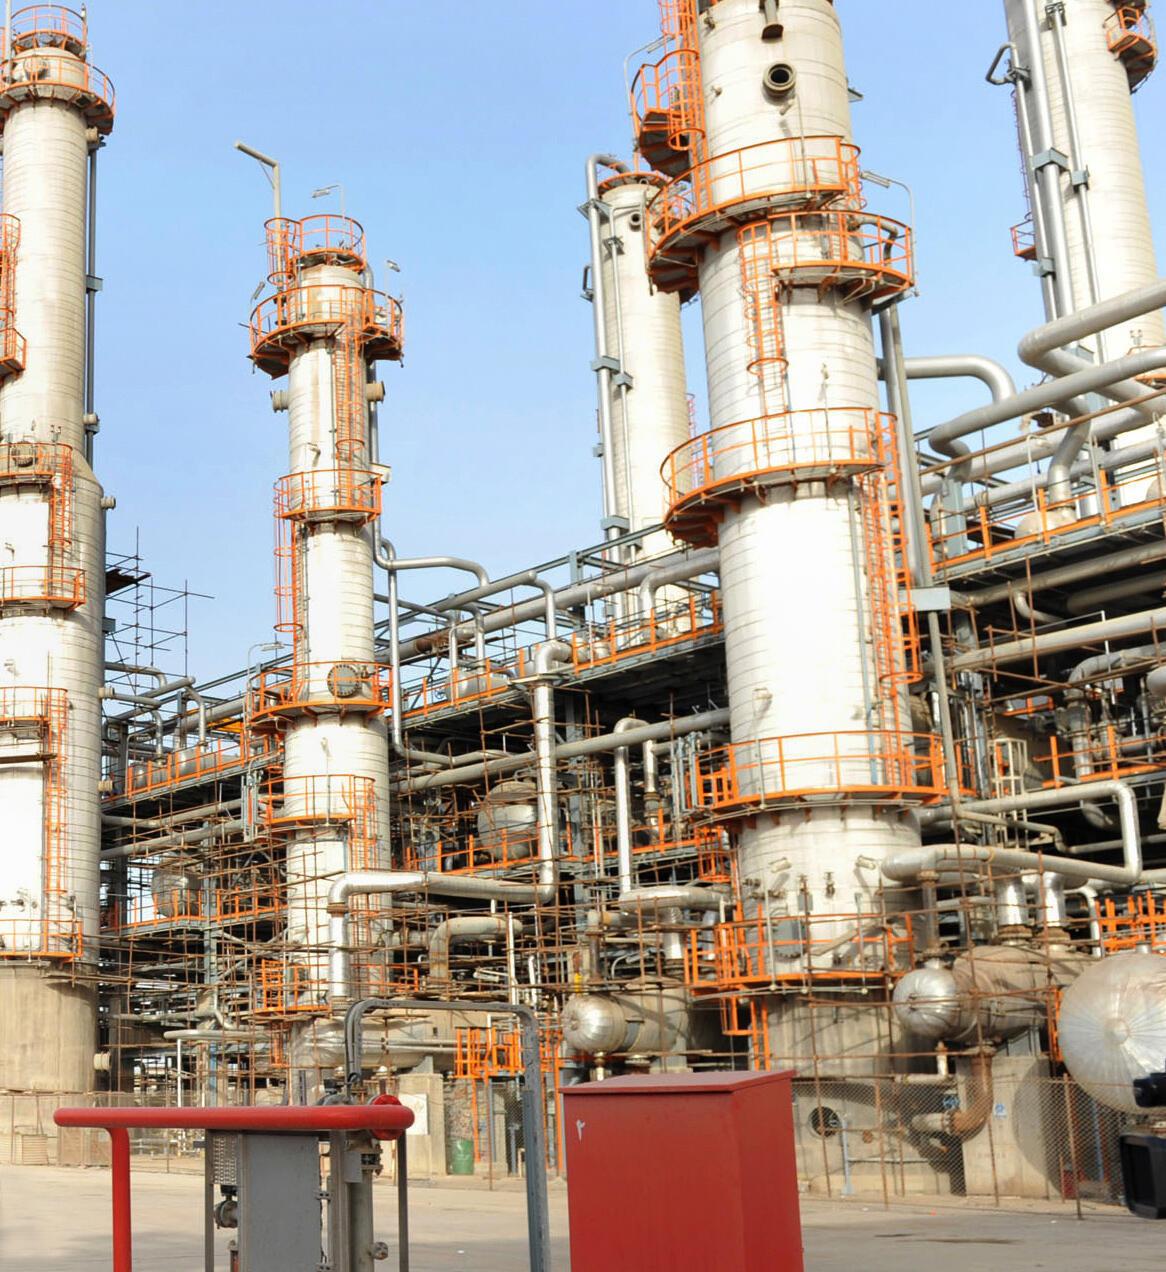 Une raffinerie à Abadan, en Iran.